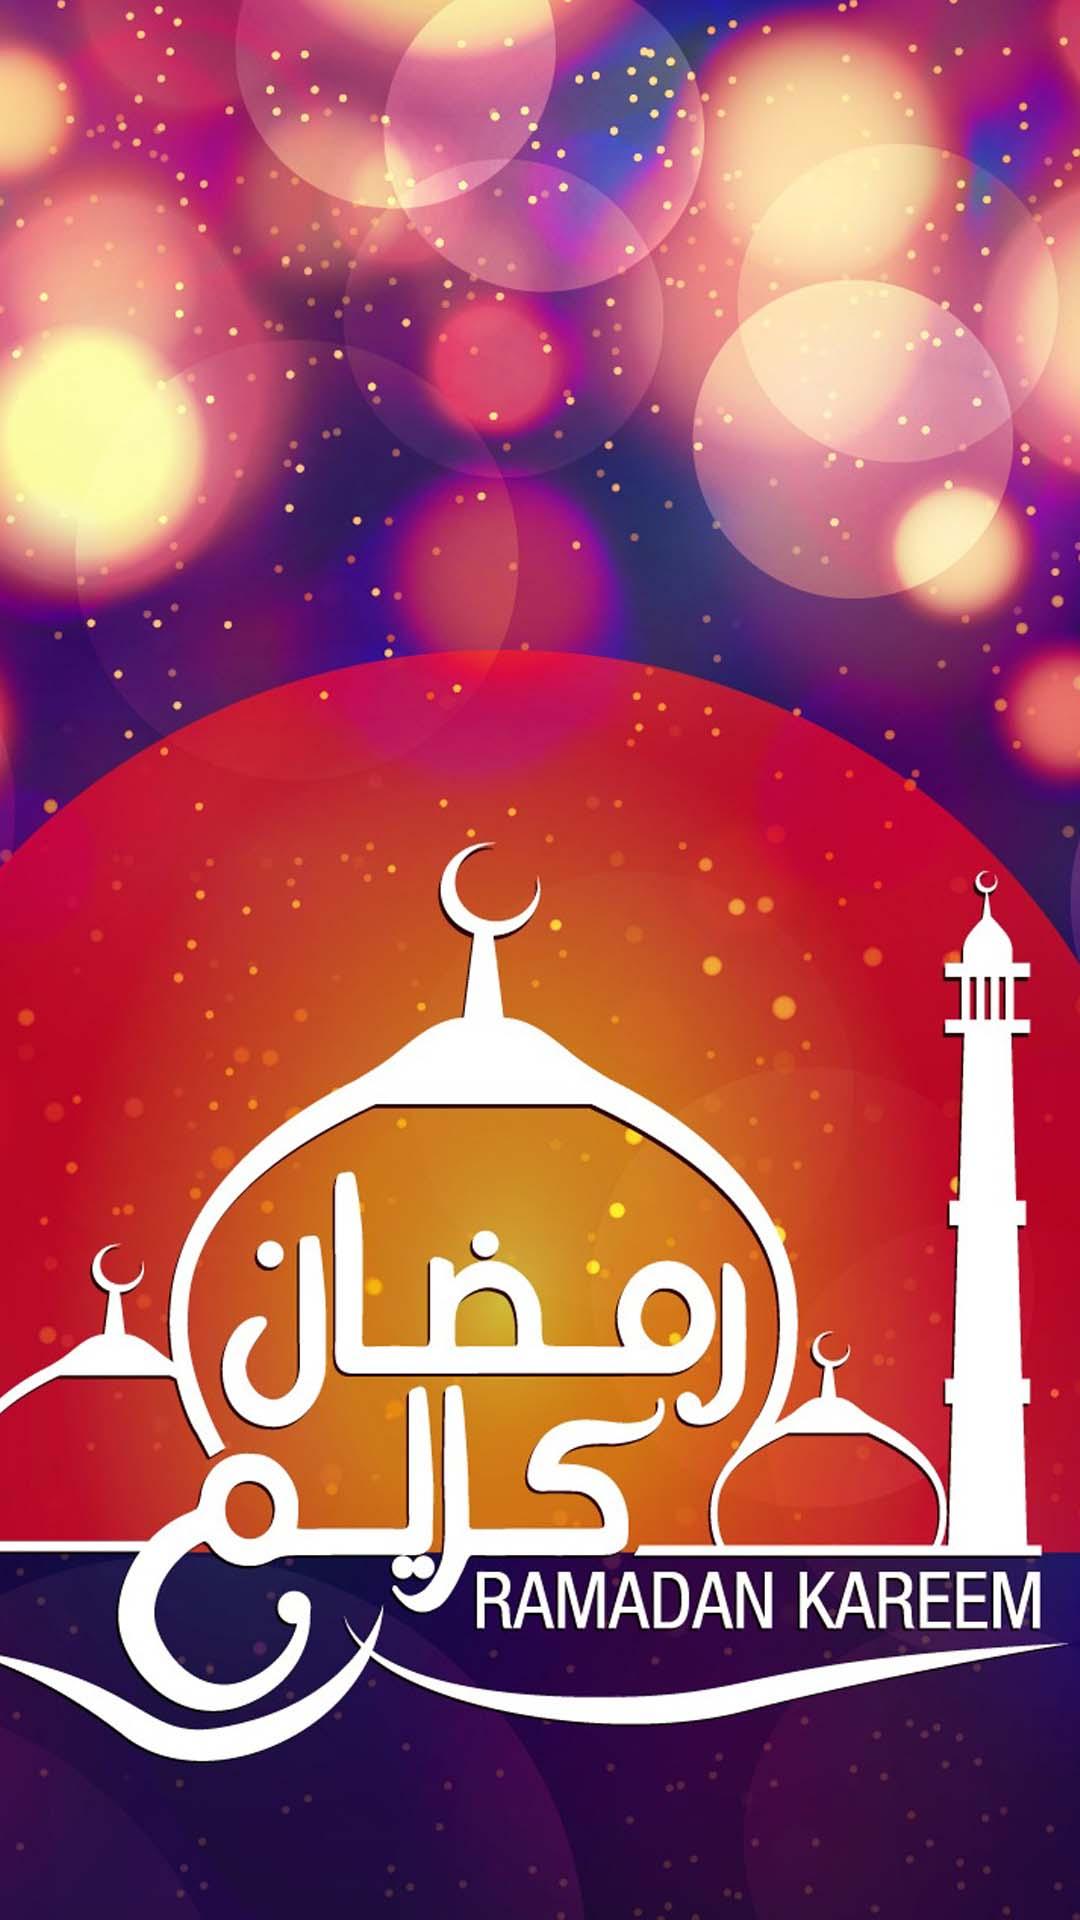 خلفيات موبايل رمضان كريم Mobile Wallpapers HD 1 خلفيات موبايل رمضان كريم Mobile Wallpapers HD